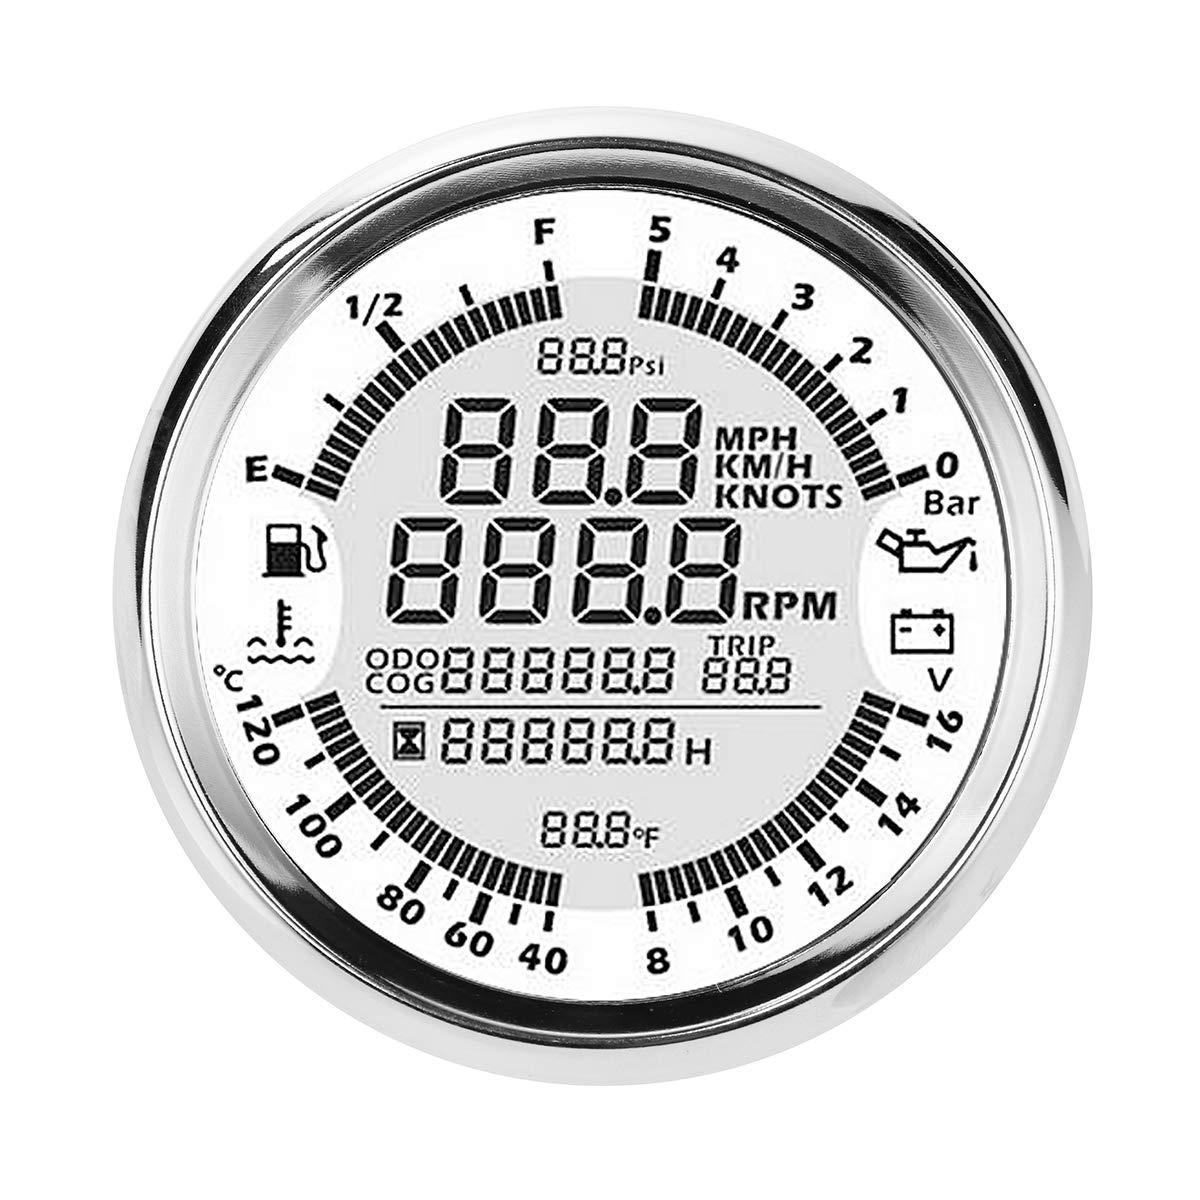 NeDonald 85mm GPS Speedometer Oil Pressure Fuel Gauge Tachometer with Antenna by NeDonald (Image #1)